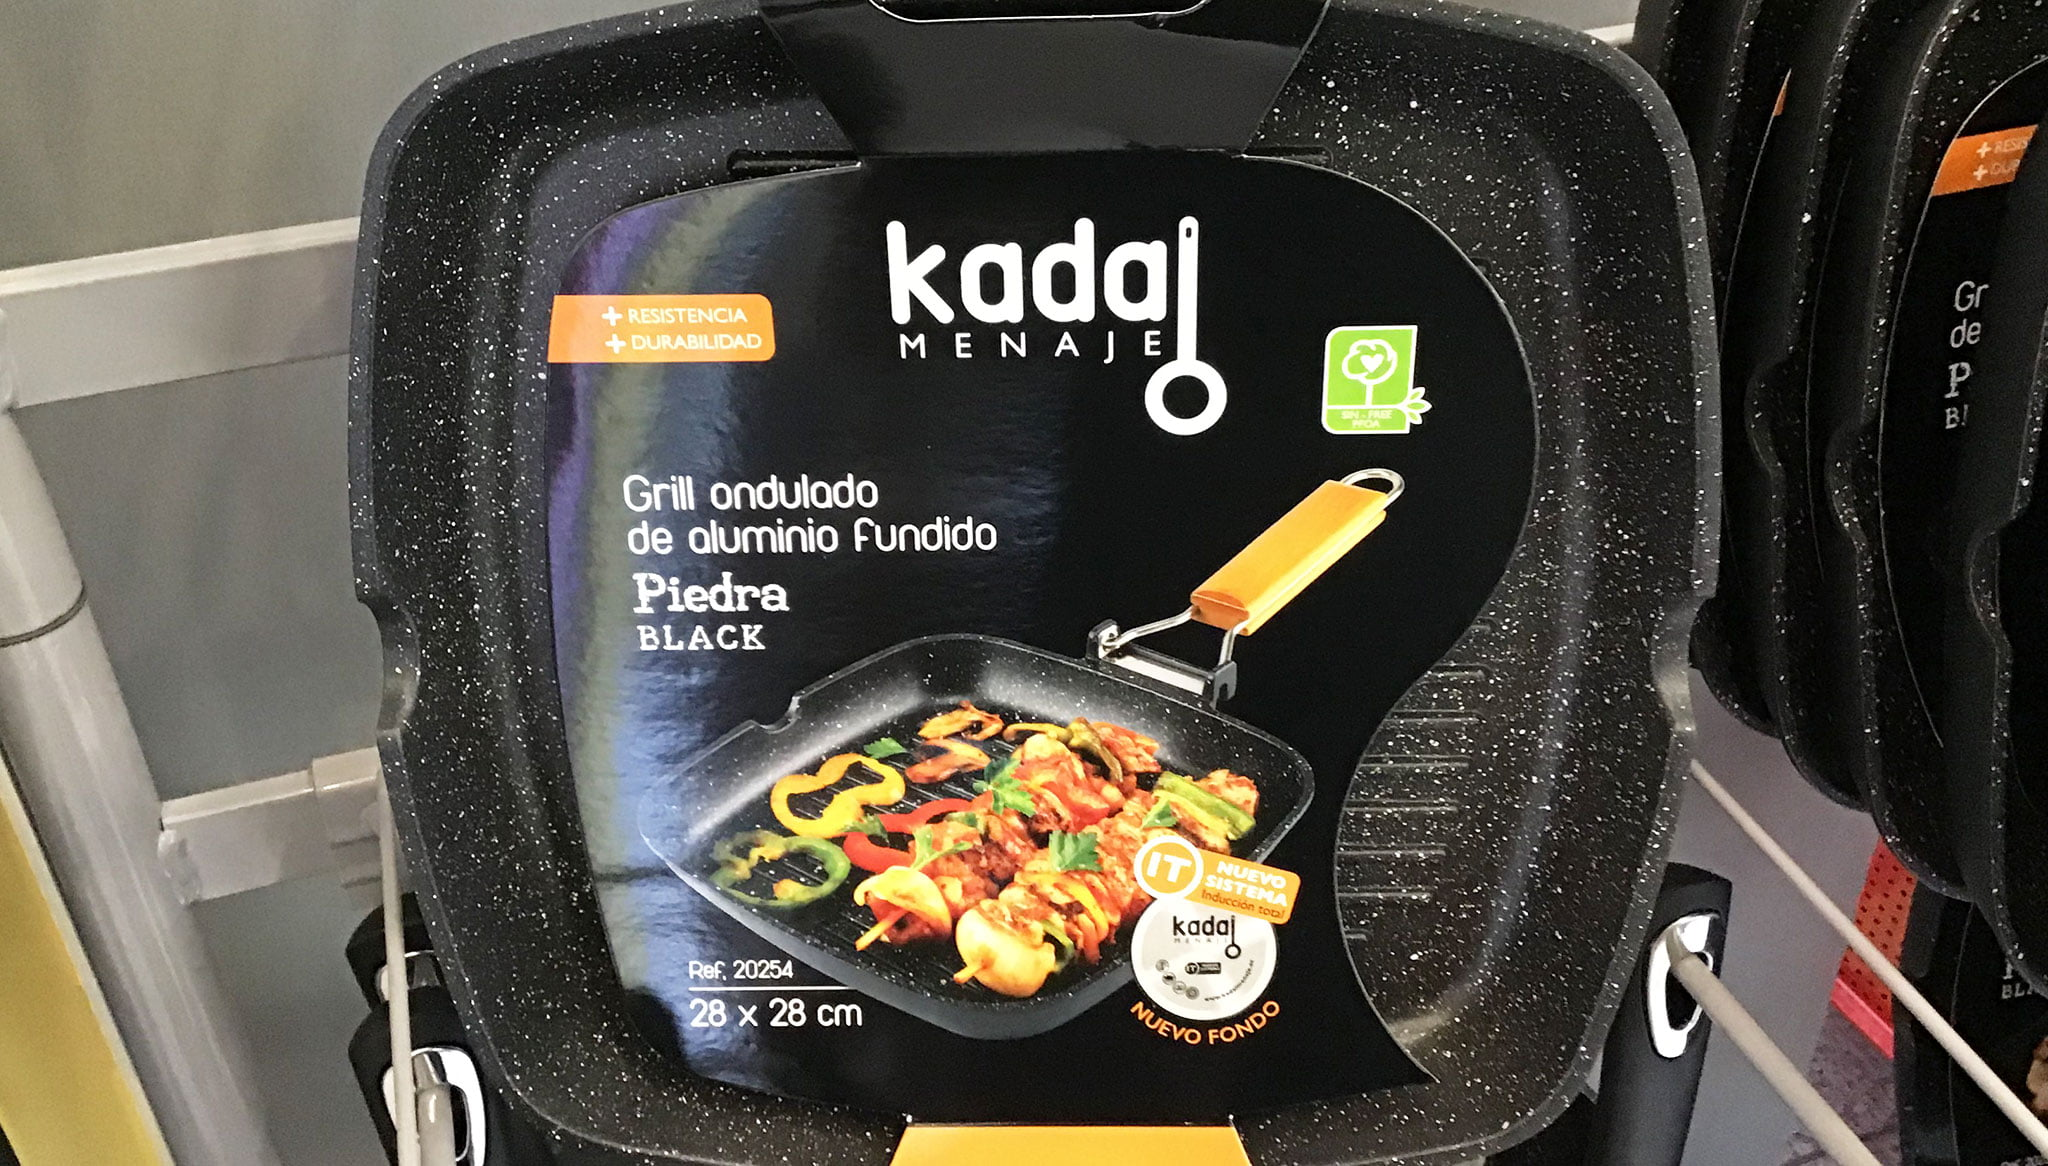 Grill ondulado Kadal Menaje – Coloma 2 Ferreteros